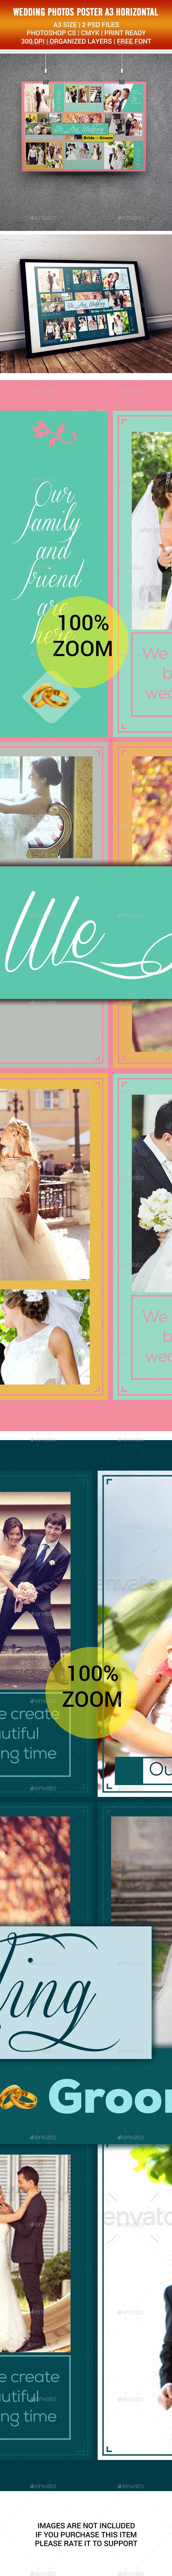 Wedding Poster A3 - Flyers Print Templates